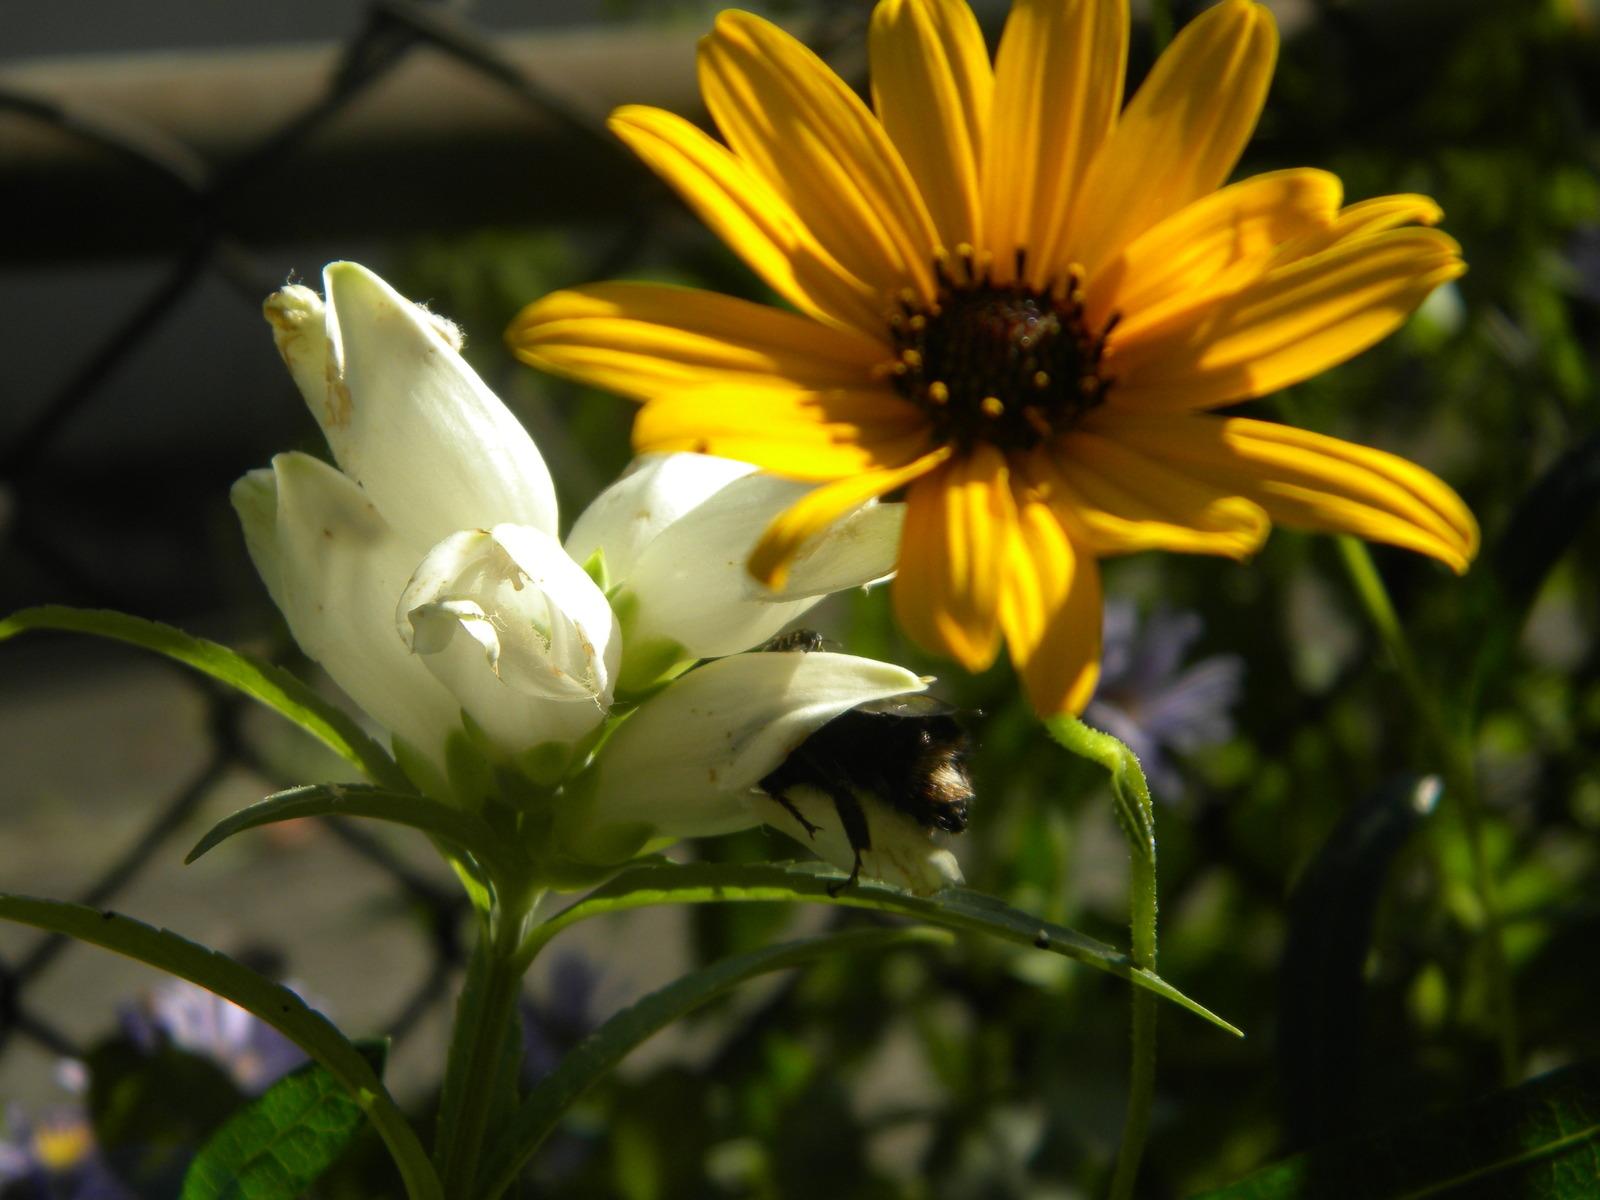 Organic Native Plant, Narrow Leaf Sunflower, Helianthus angustifolius